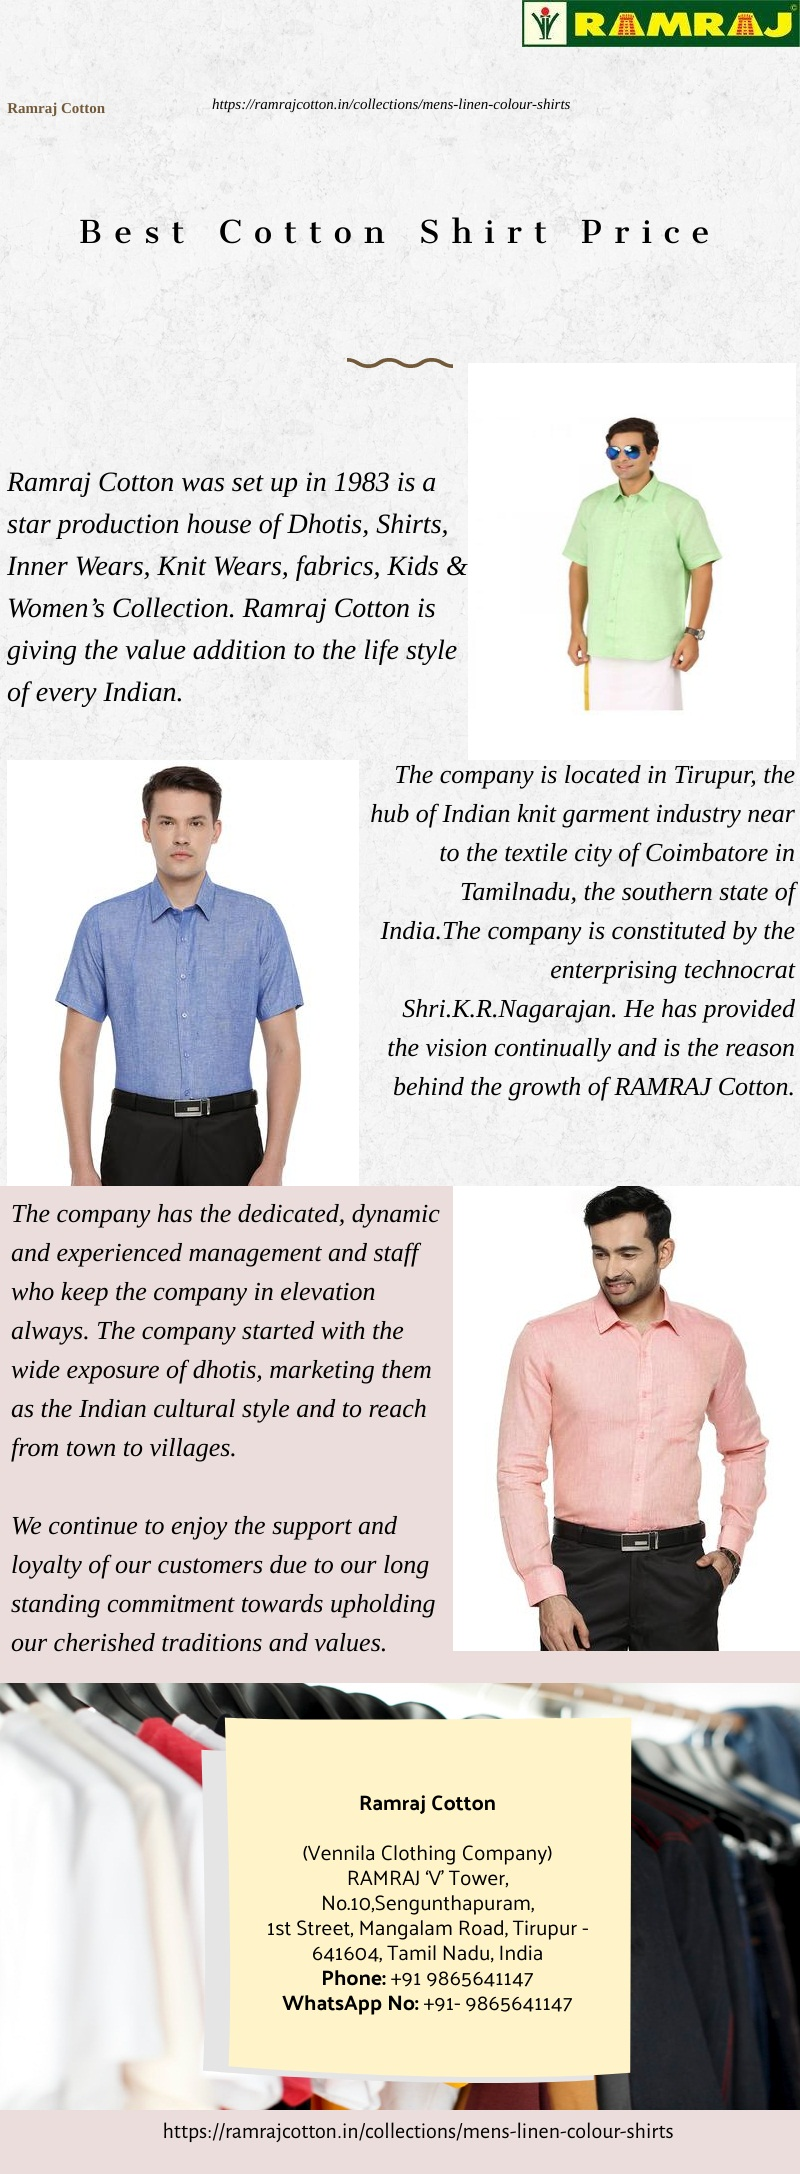 Ramraj Cotton White Shirts Online